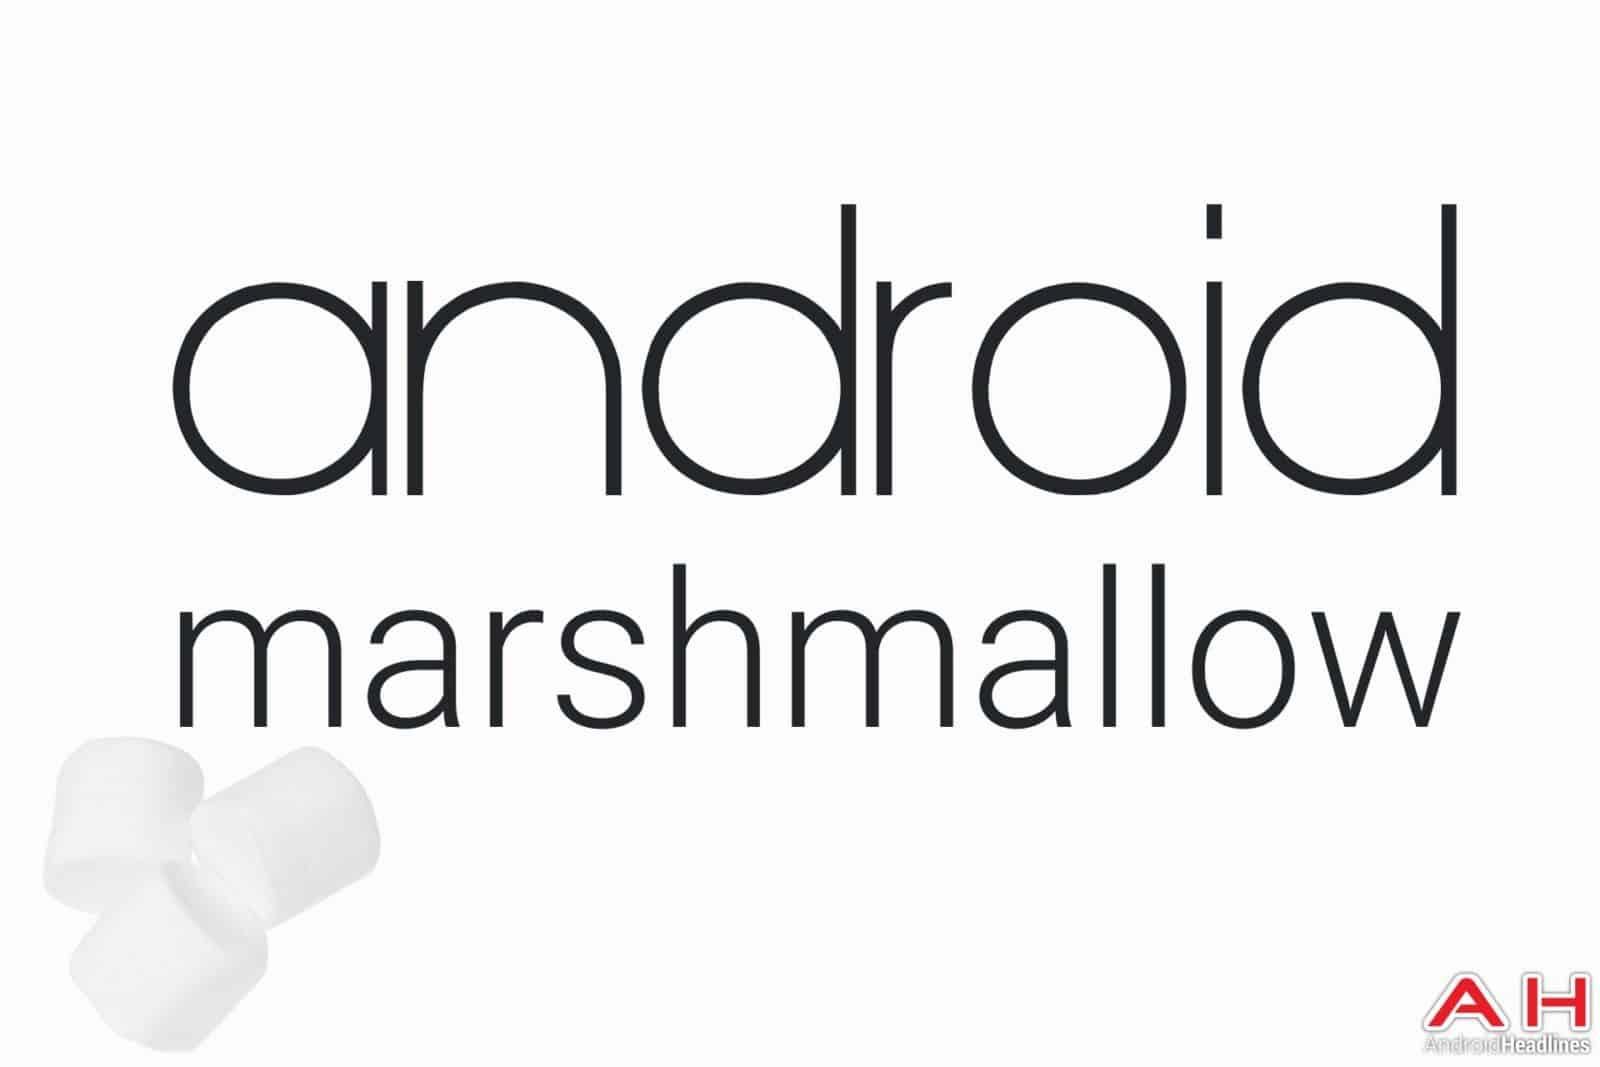 AH Android Marshmallow Logo 1.93